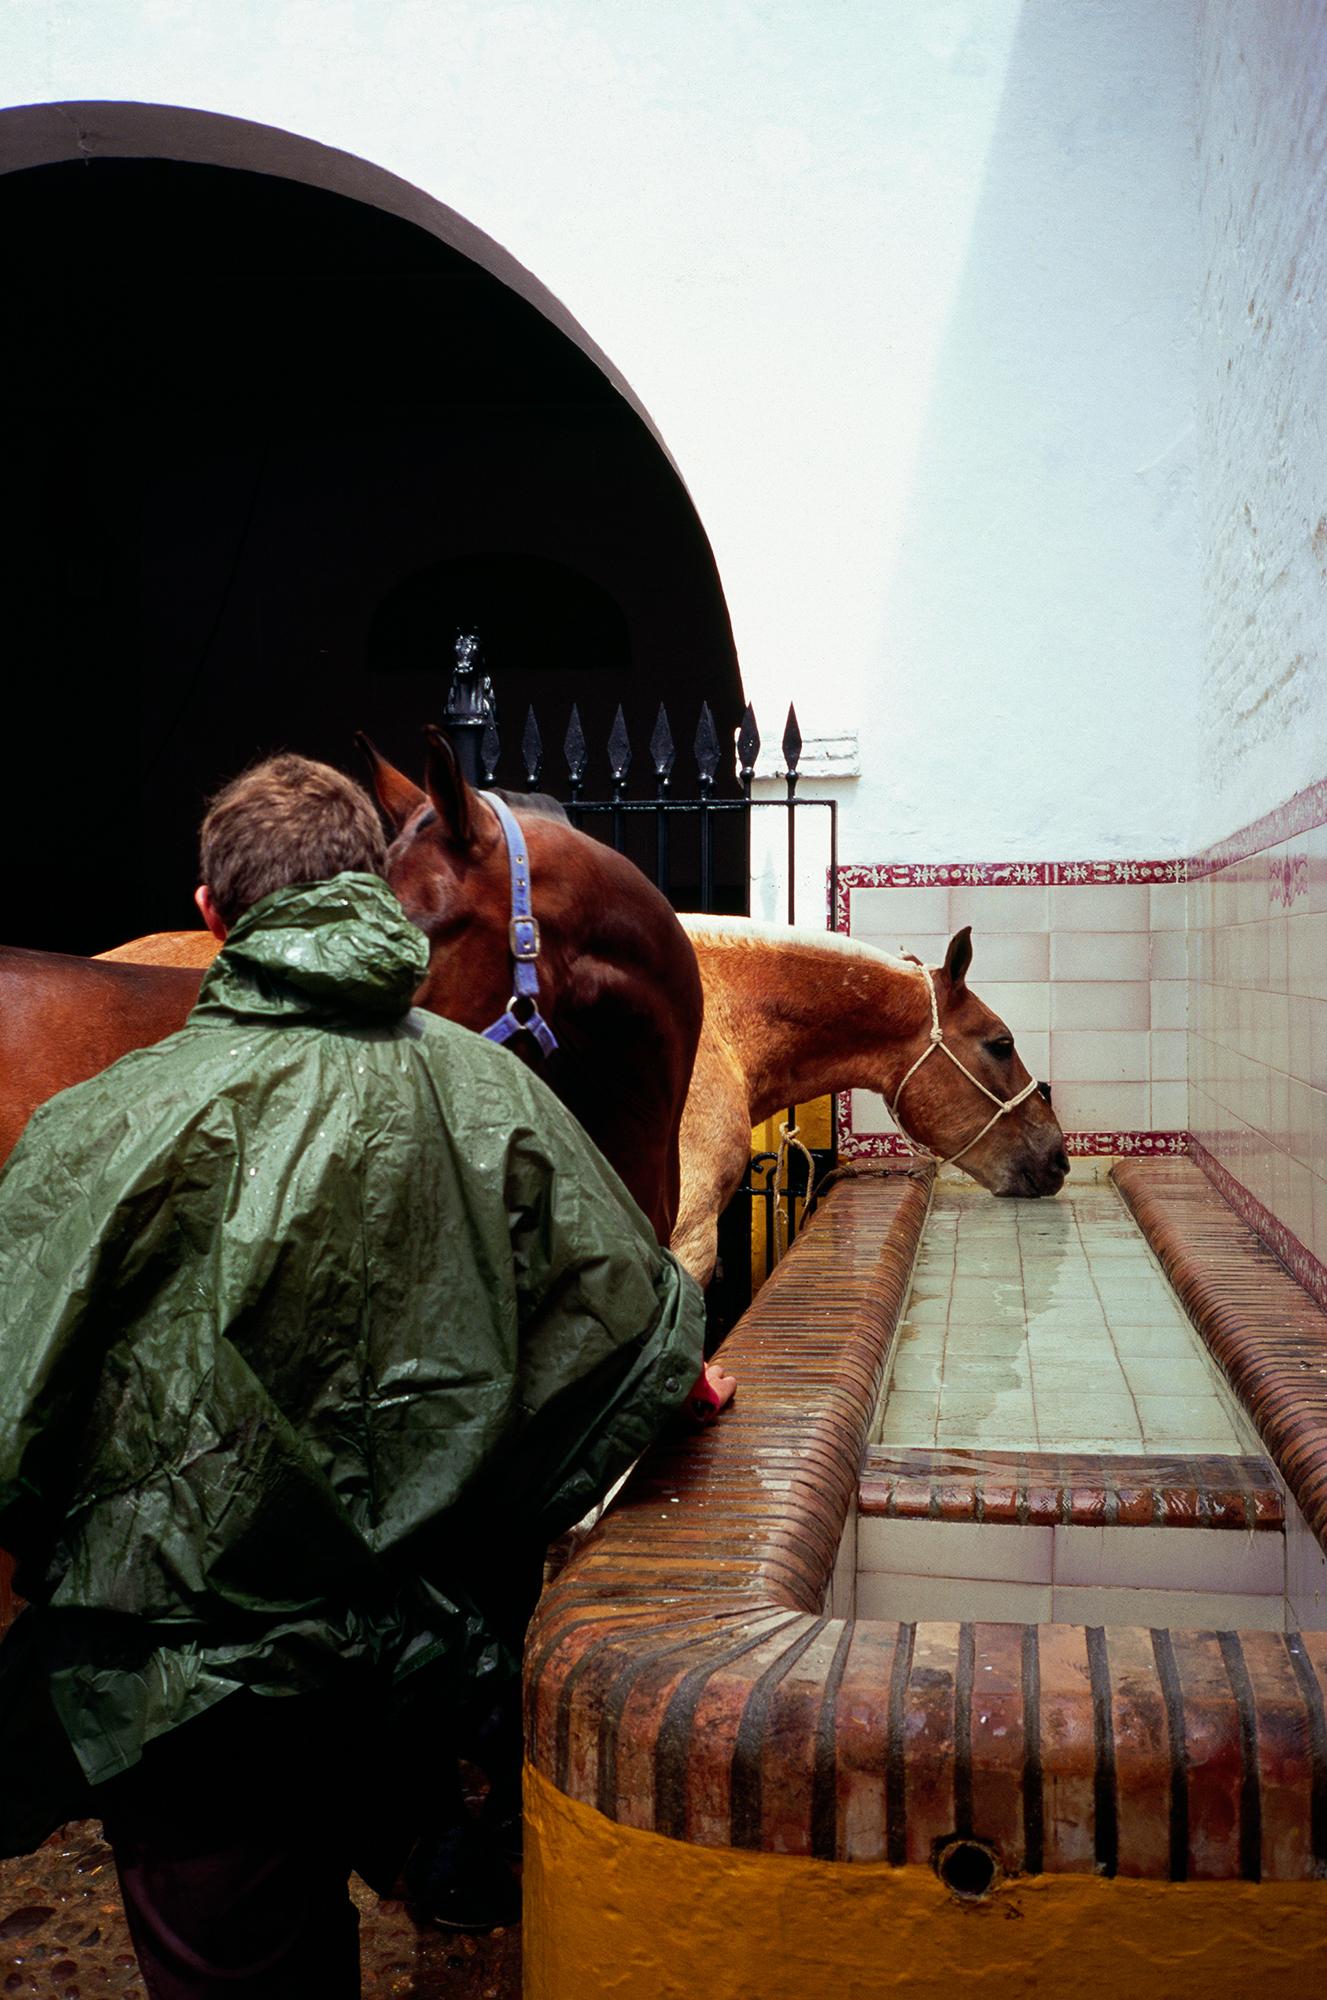 Boy Leading a Horse, Seville, 2016